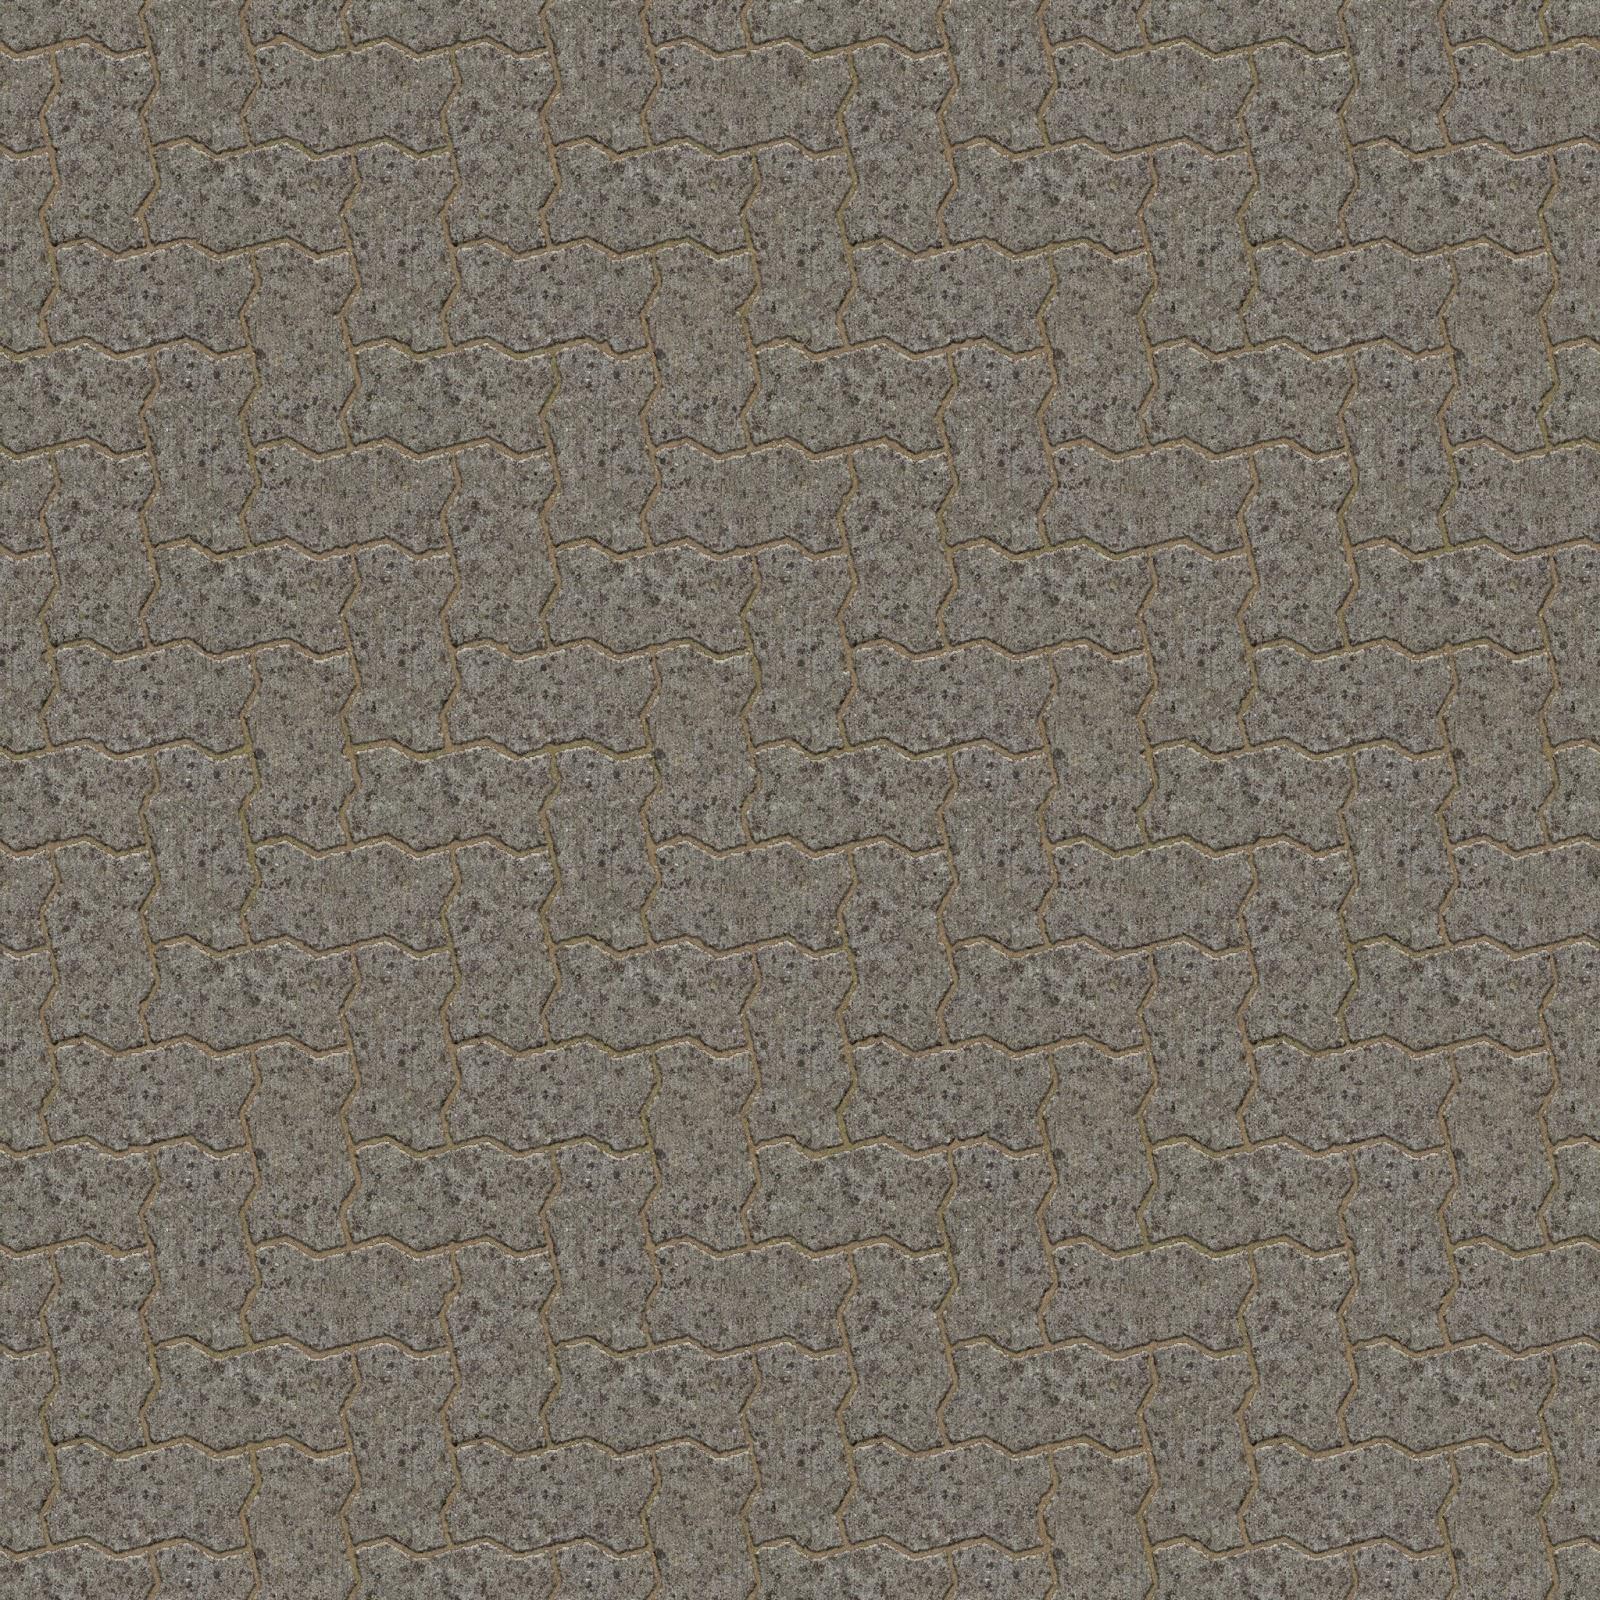 Brick pavement classic seamless texture 2048x2048